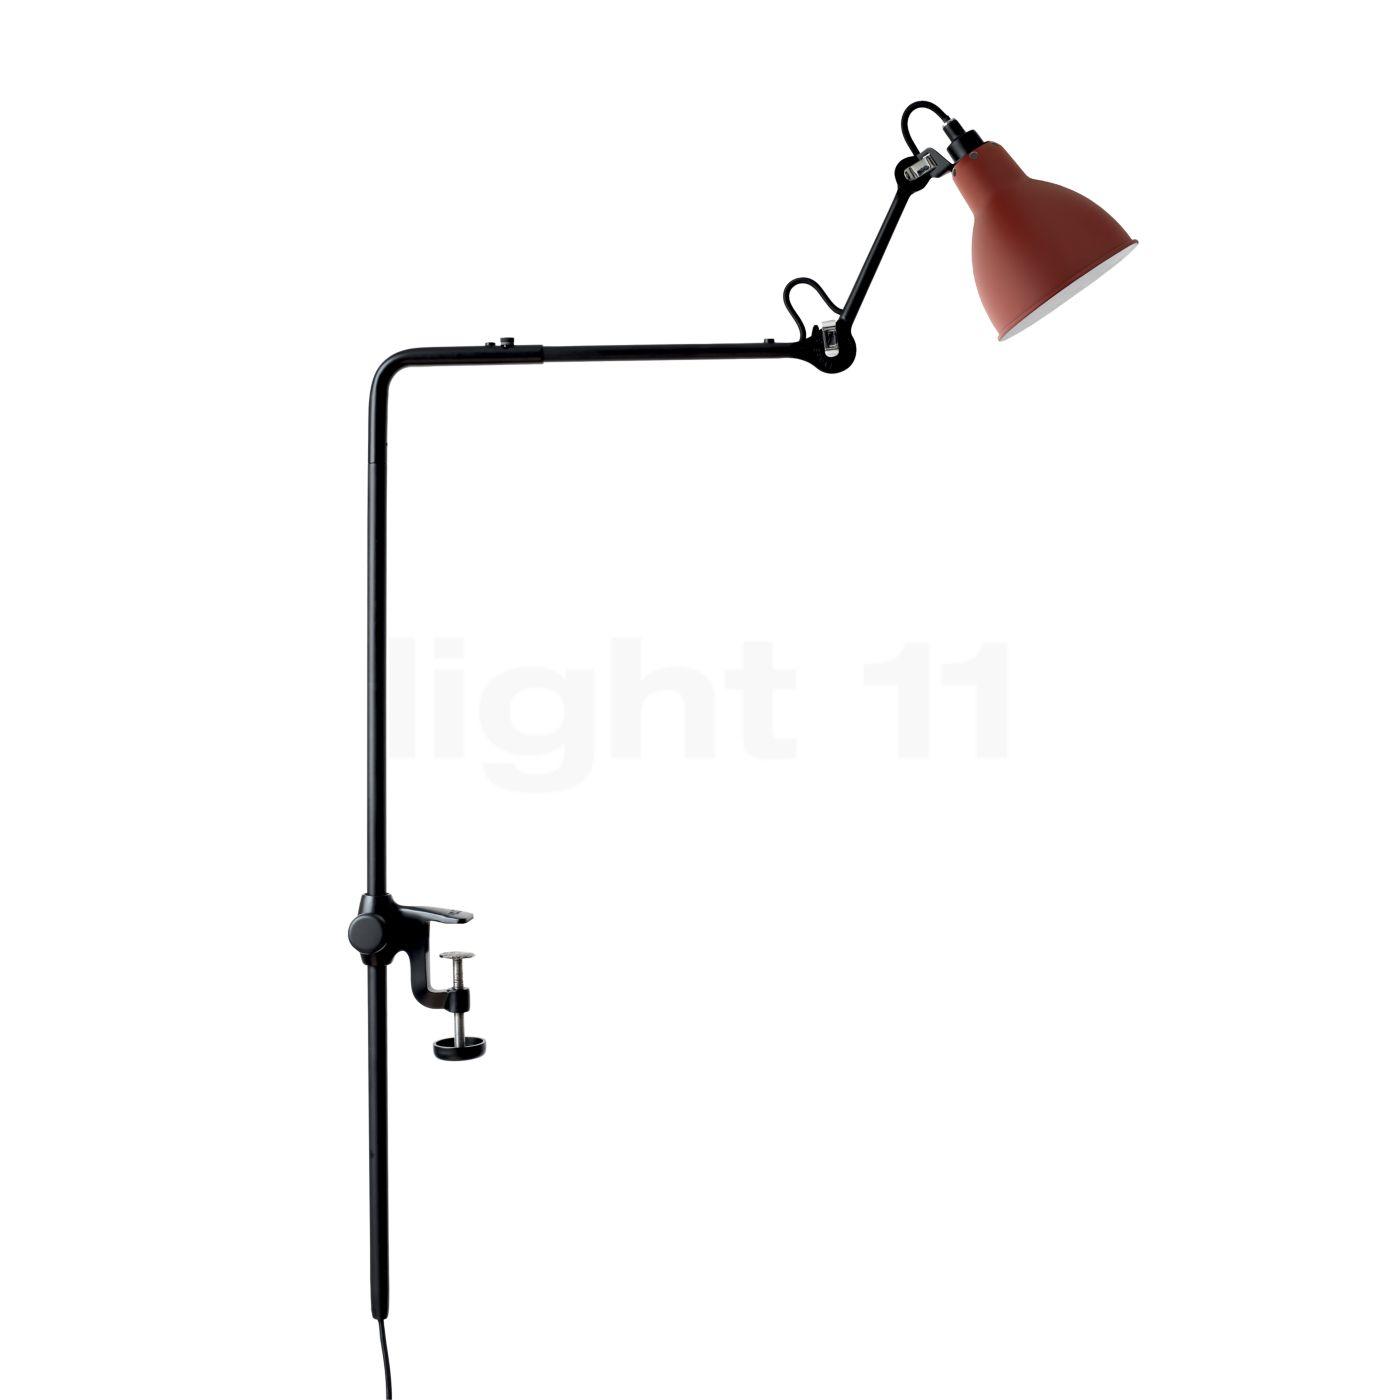 DCW Lampe Gras No 226 Klemmleuchte, rot 226 BL-RED